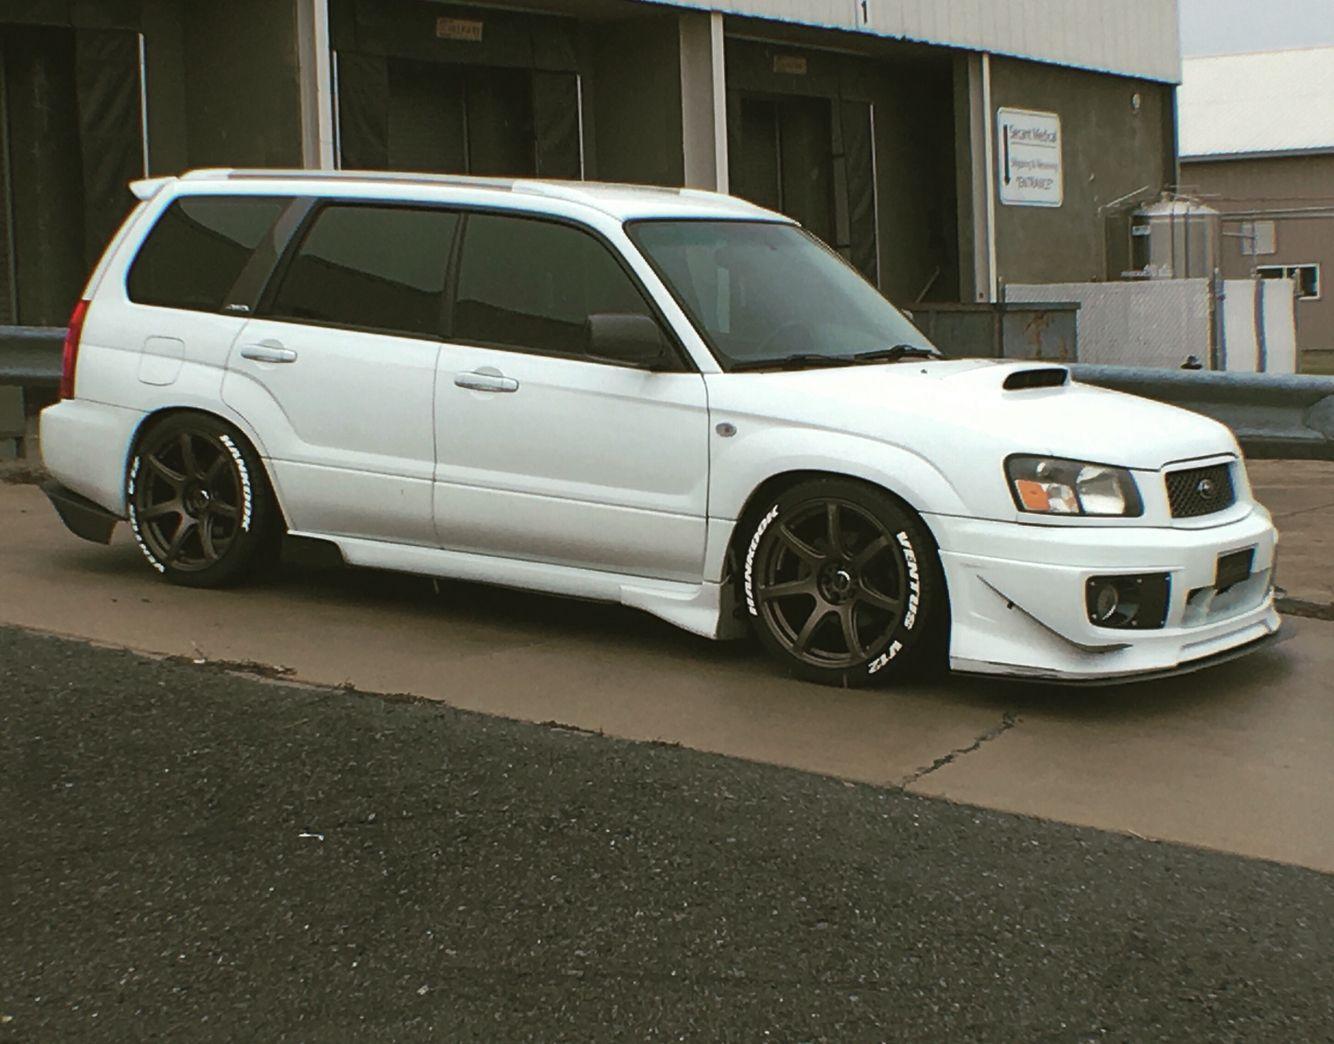 Pimped Subaru Forester >> 2004 Subaru Forester XT … | Pinteres…